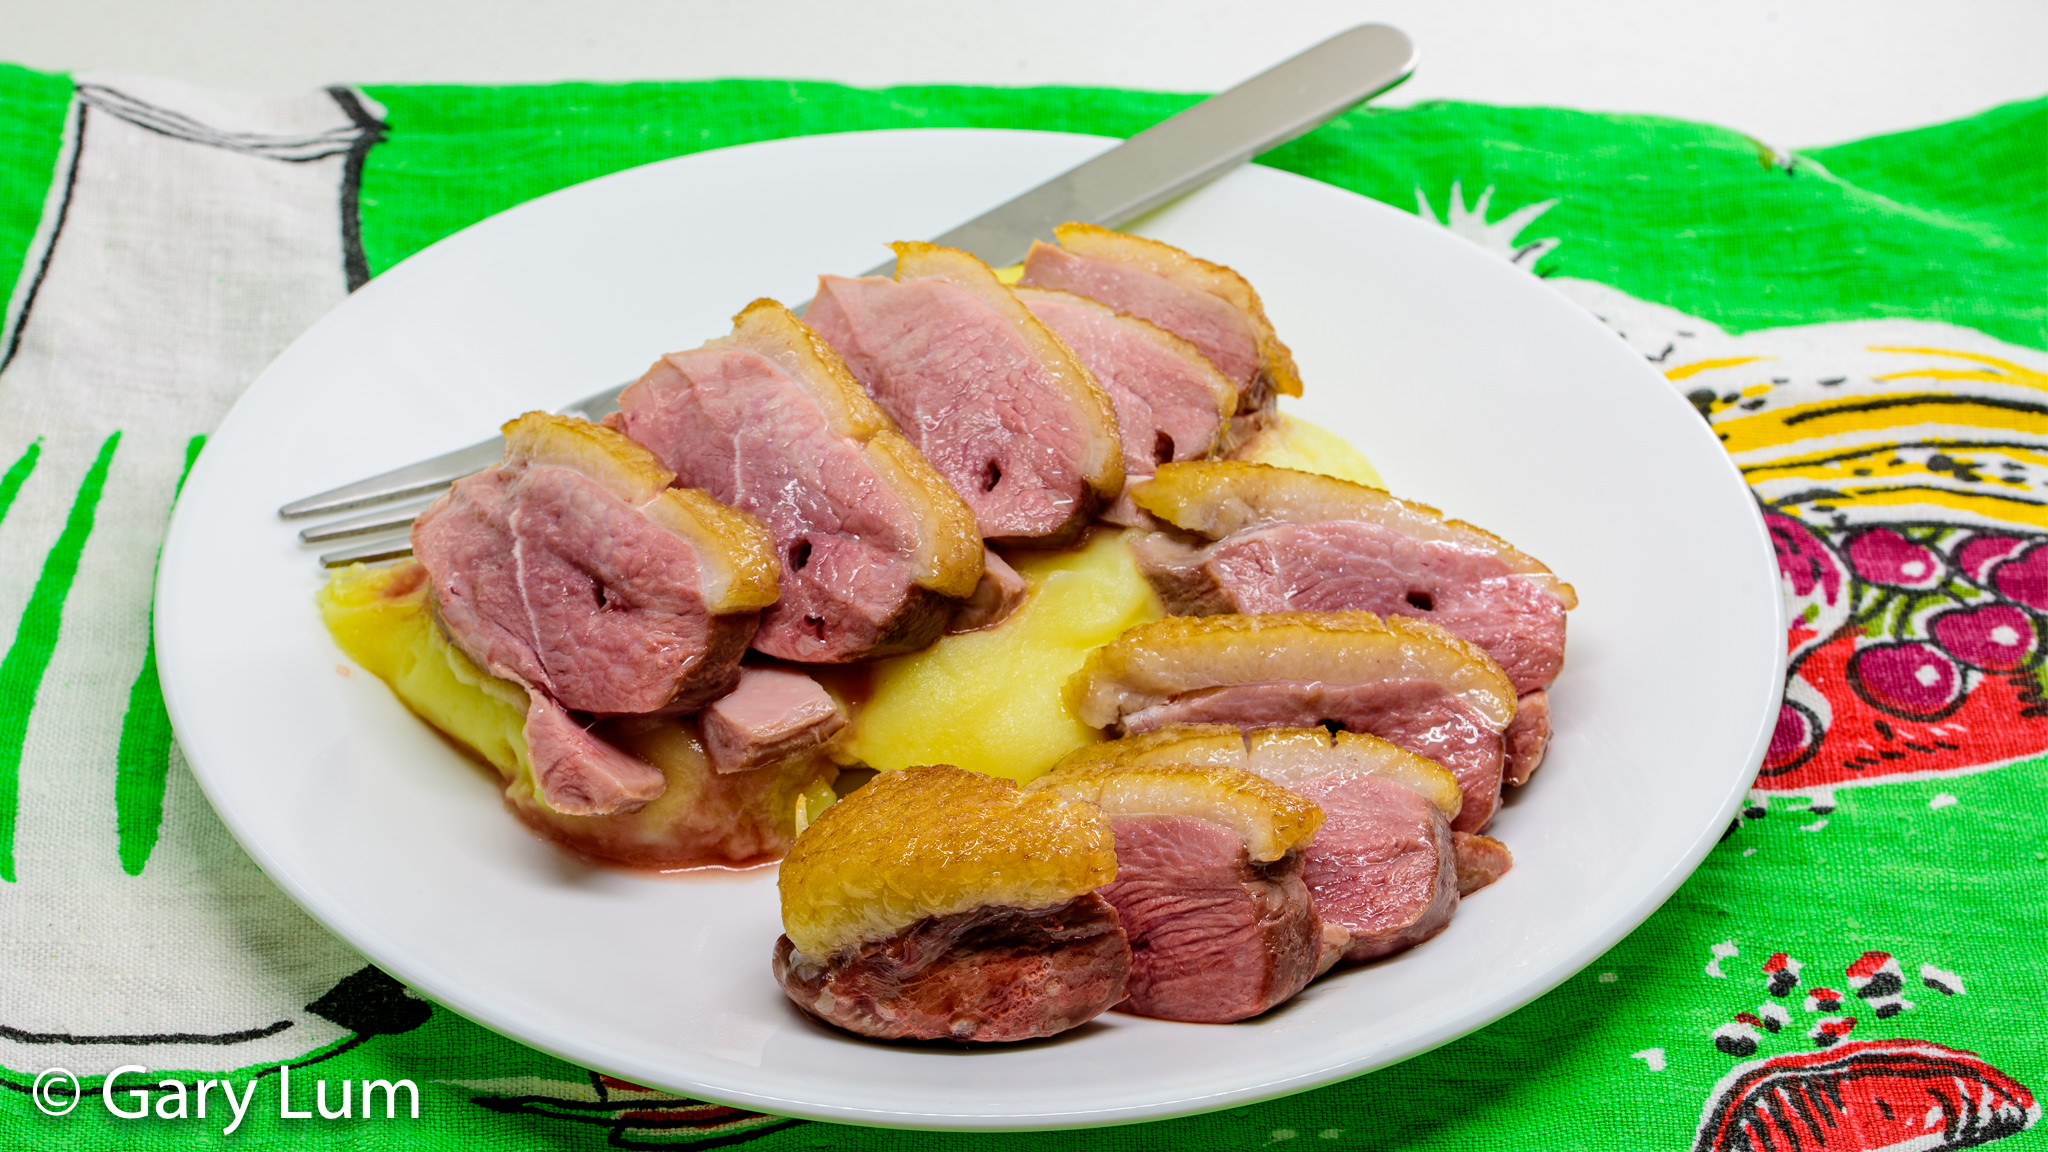 Roast duck breast and microwave radiation potato mash. Gary Lum.